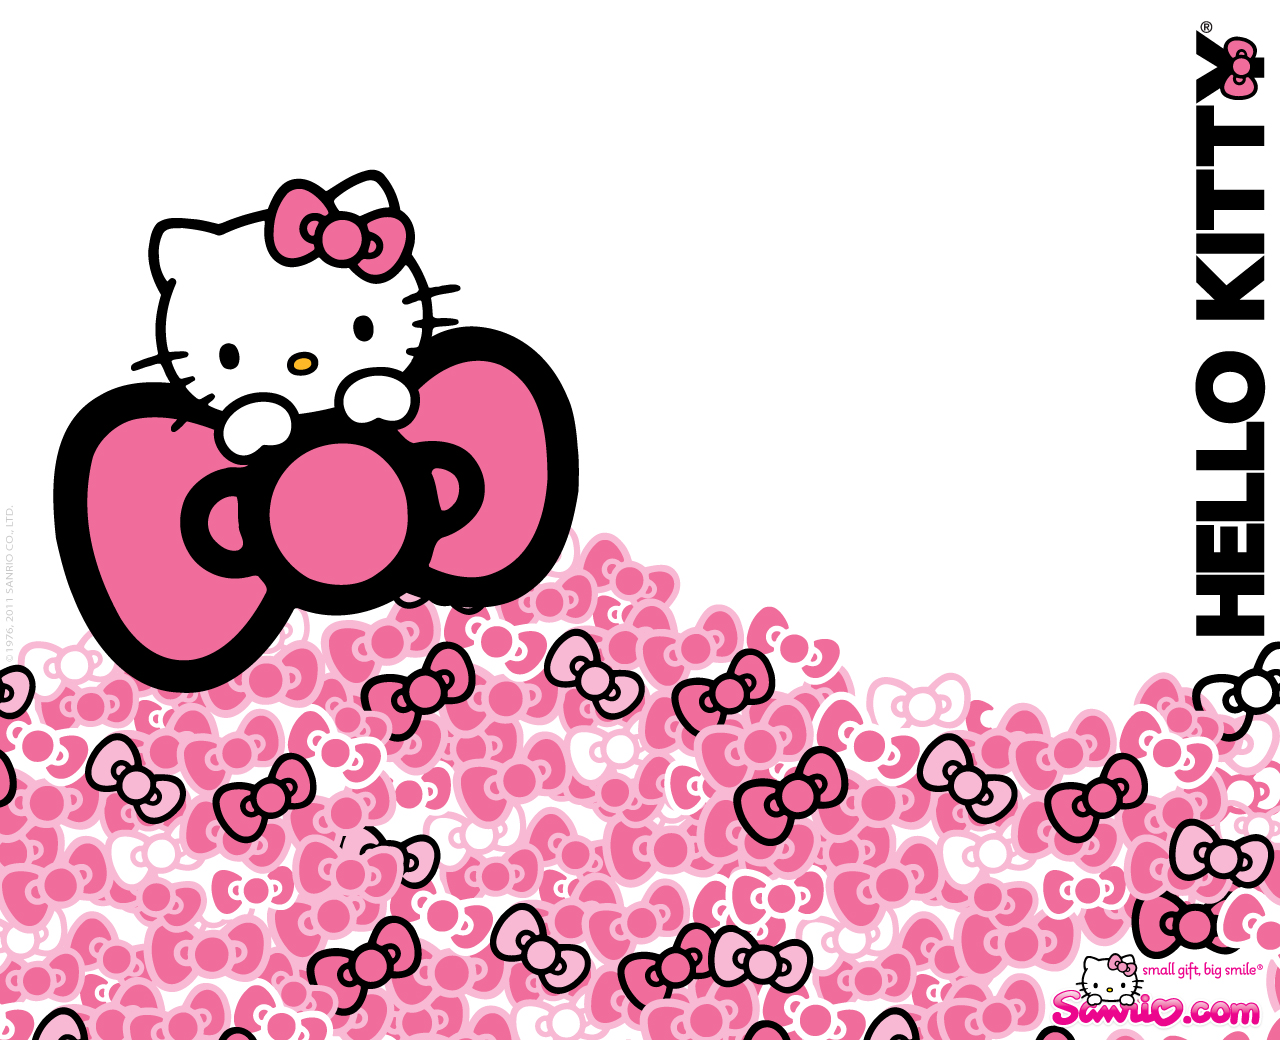 Namn:  Hello-kitty-Wallpapers-From-Sanrio-Website.jpg Visningar: 811 Storlek:  621.8 KB